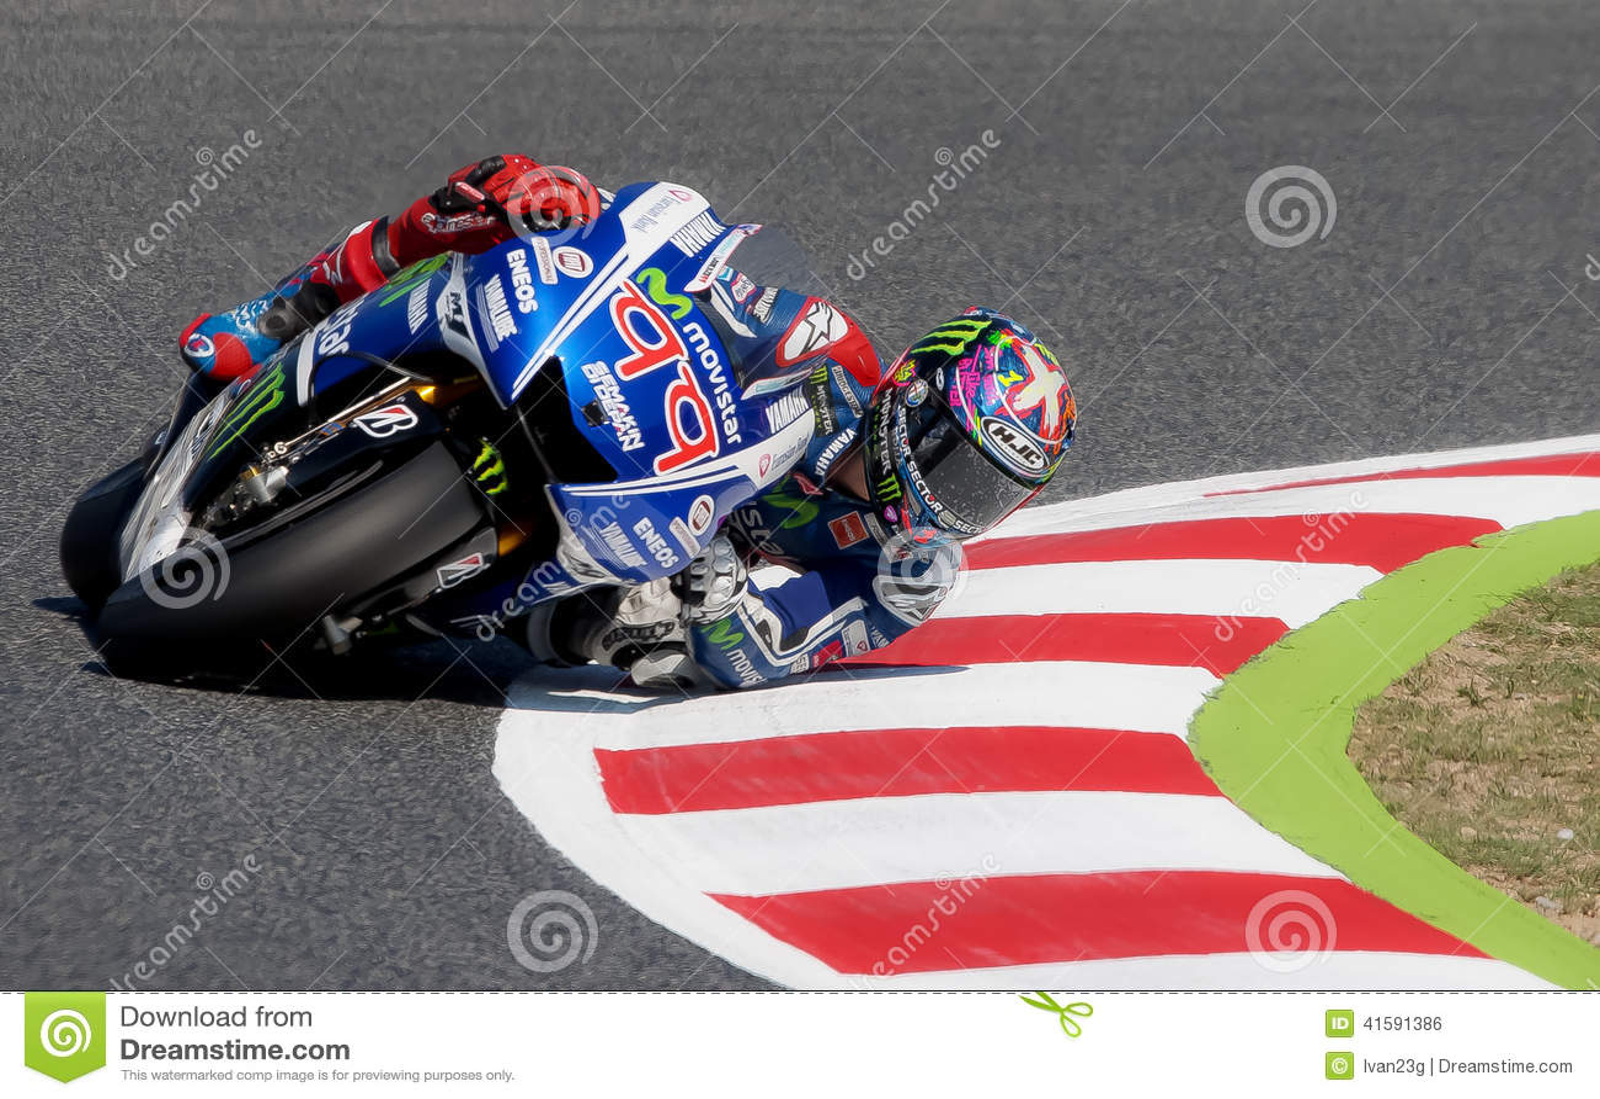 GP CATALUNYA MOTO GP - JORGE LORENZO Editorial Photo - Image: 41591386